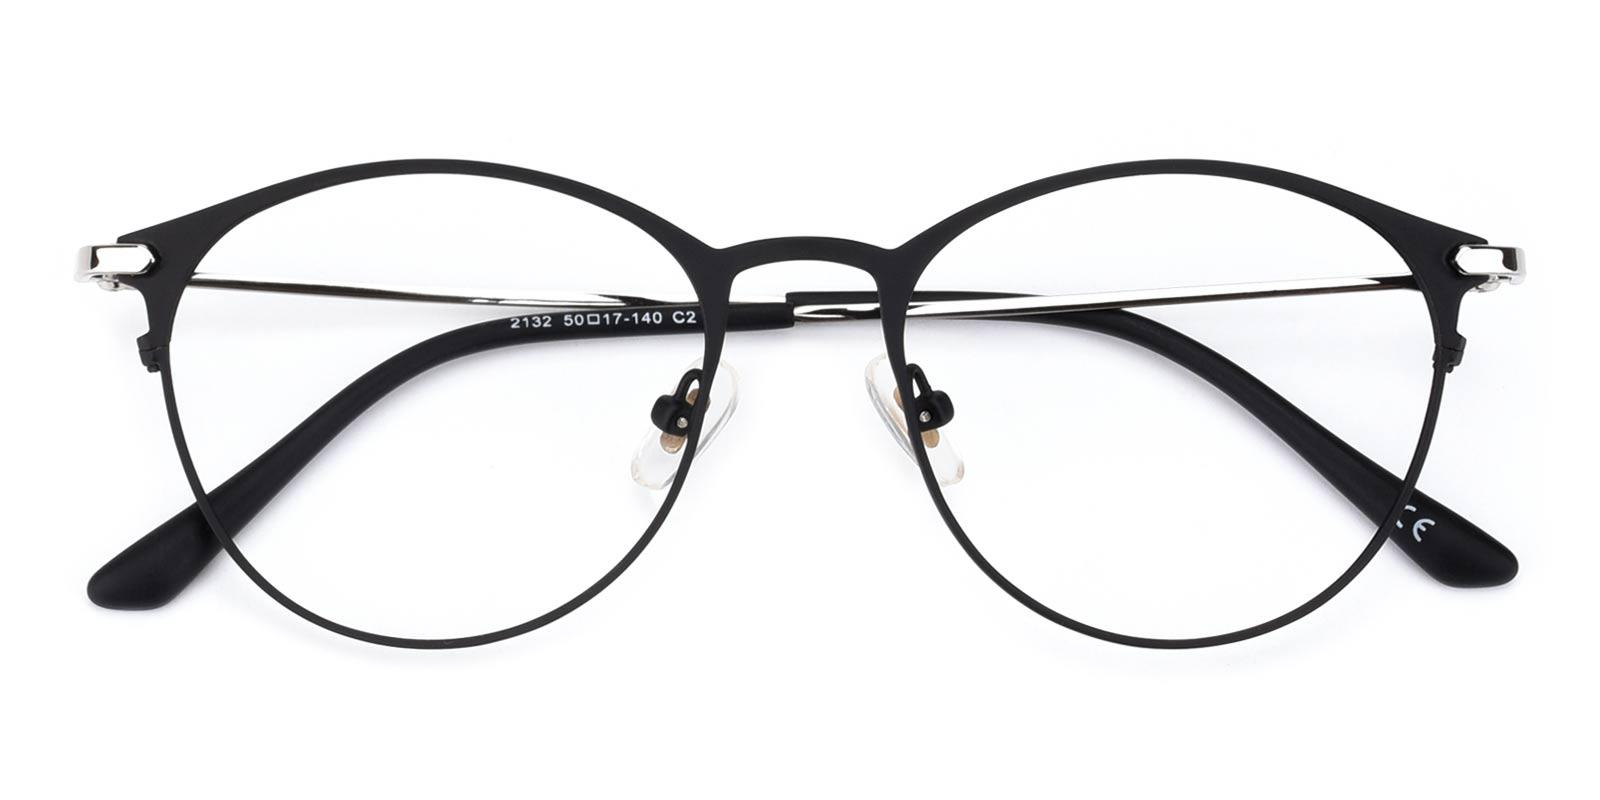 Persisto Black Metal Eyeglasses , Fashion , NosePads Frames from ABBE Glasses